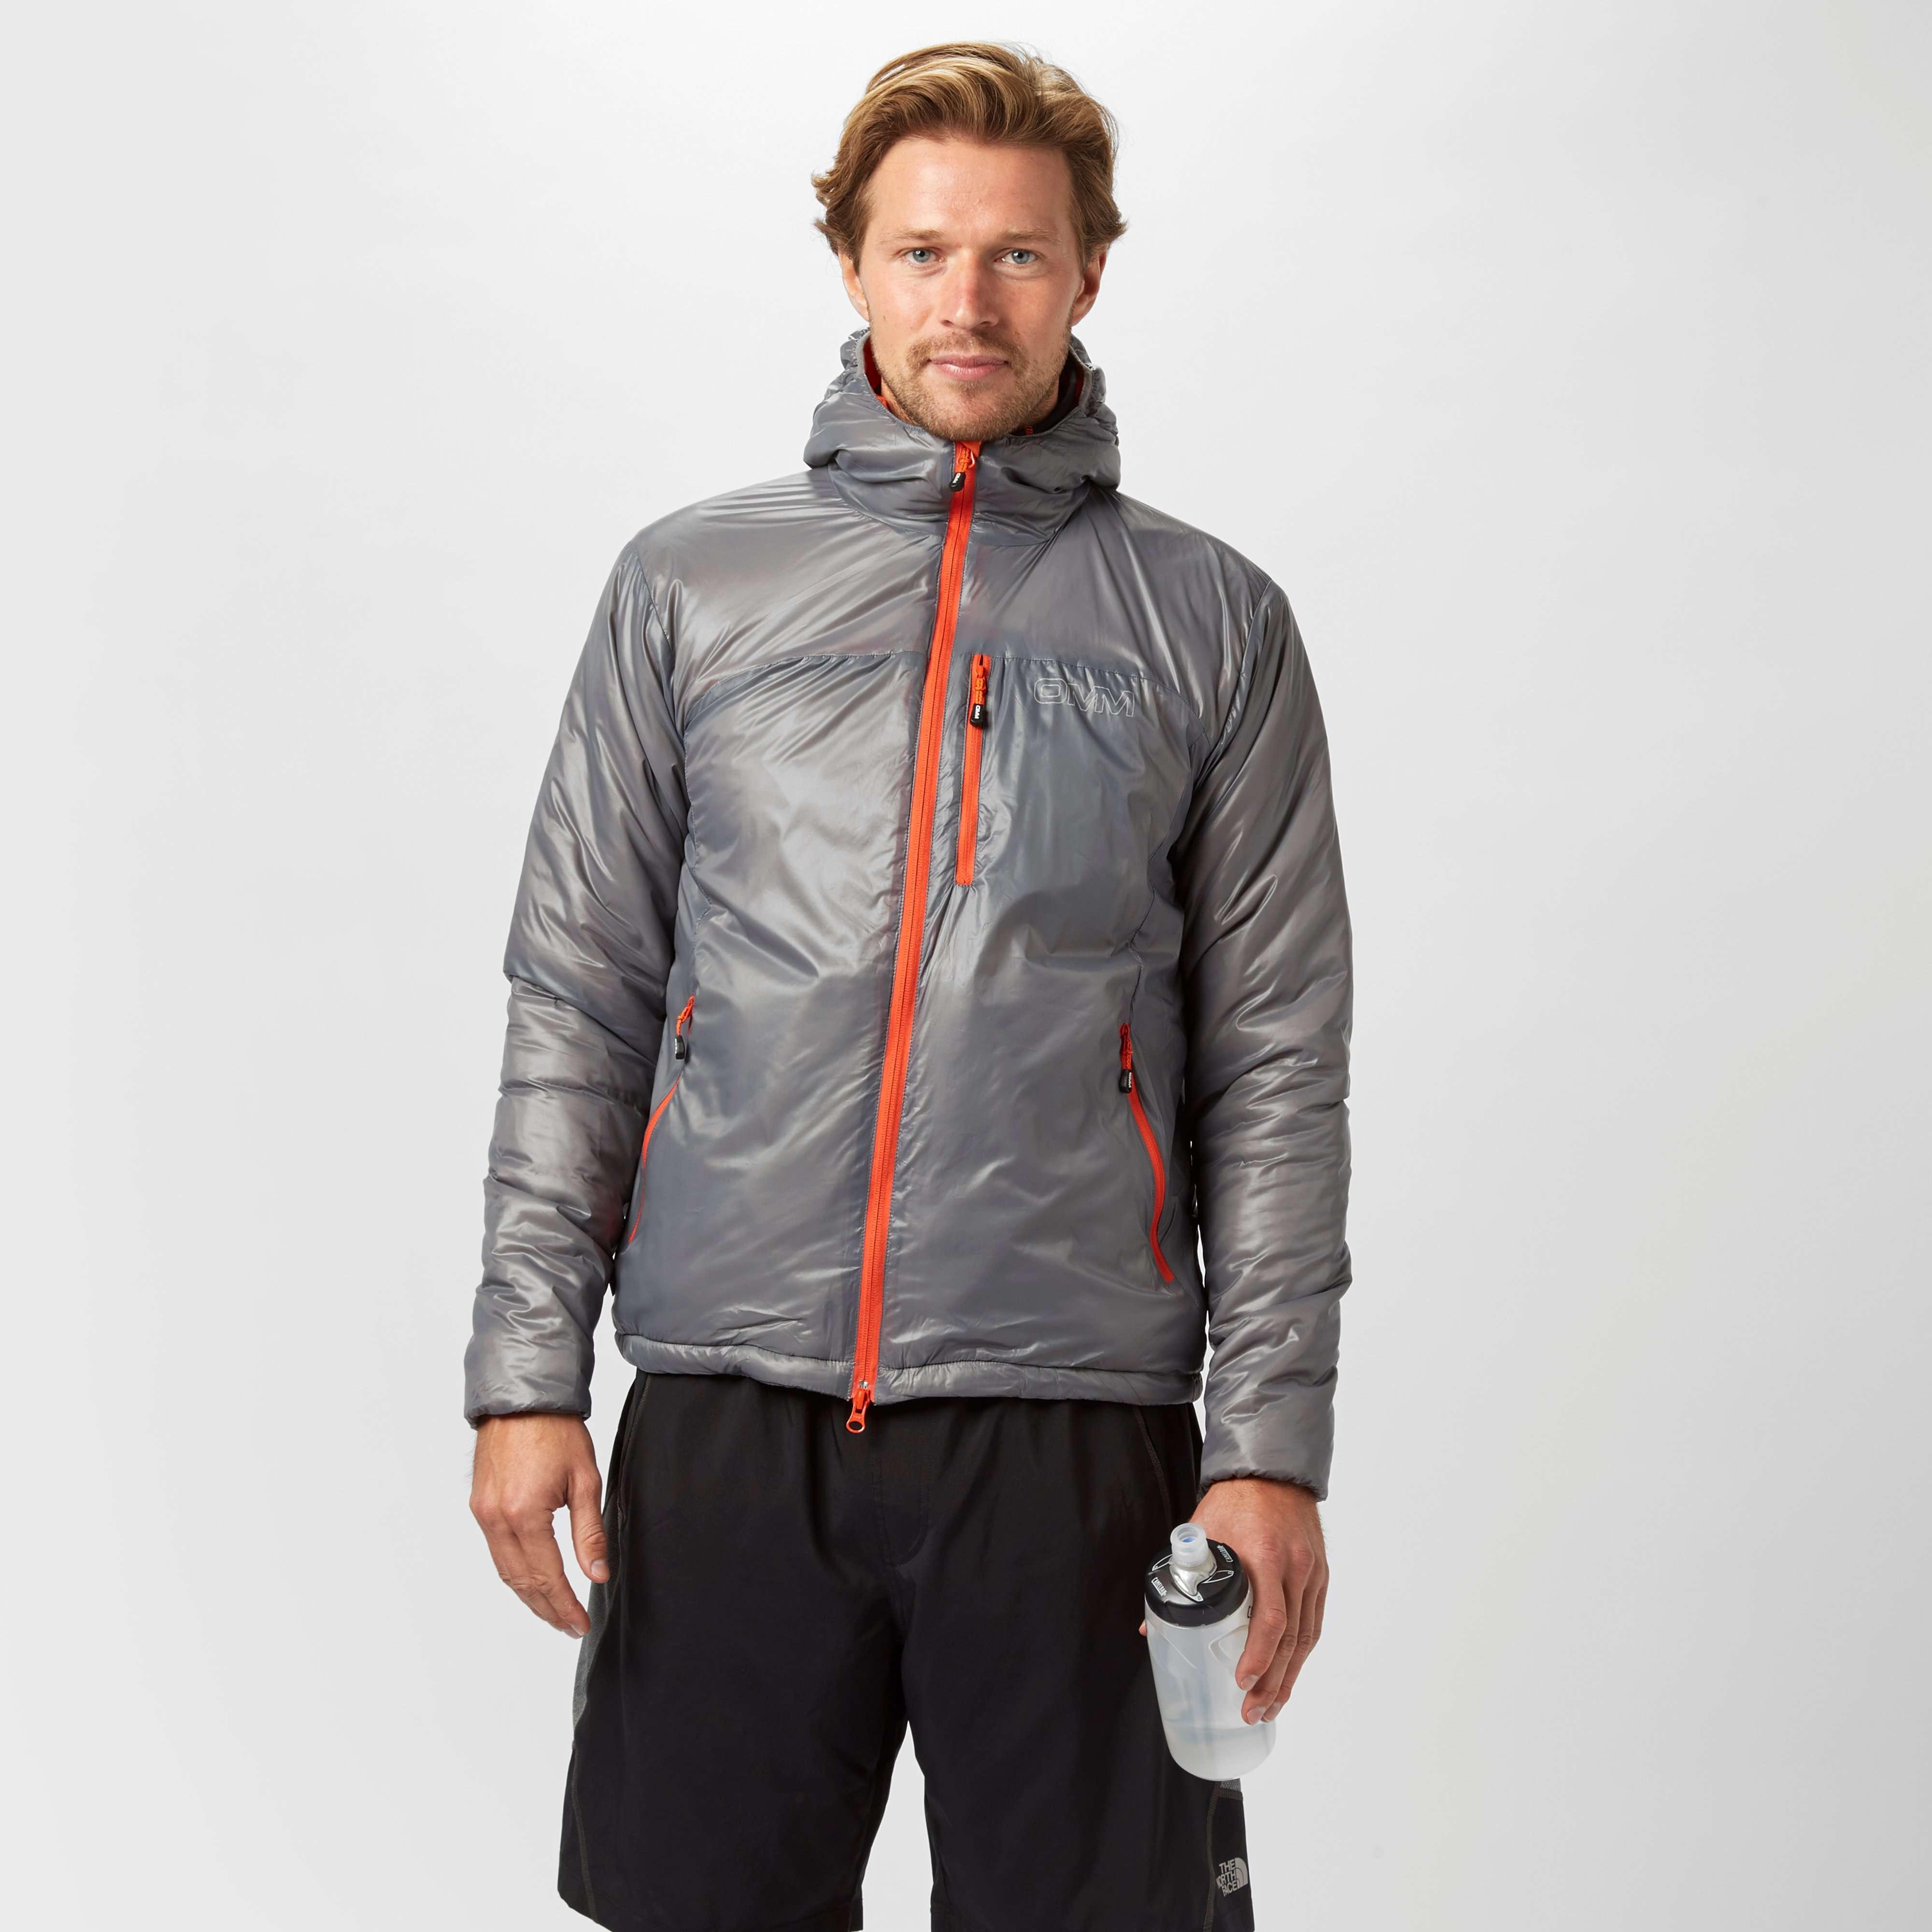 OMM OMM Men's Mountain Raid Jacket